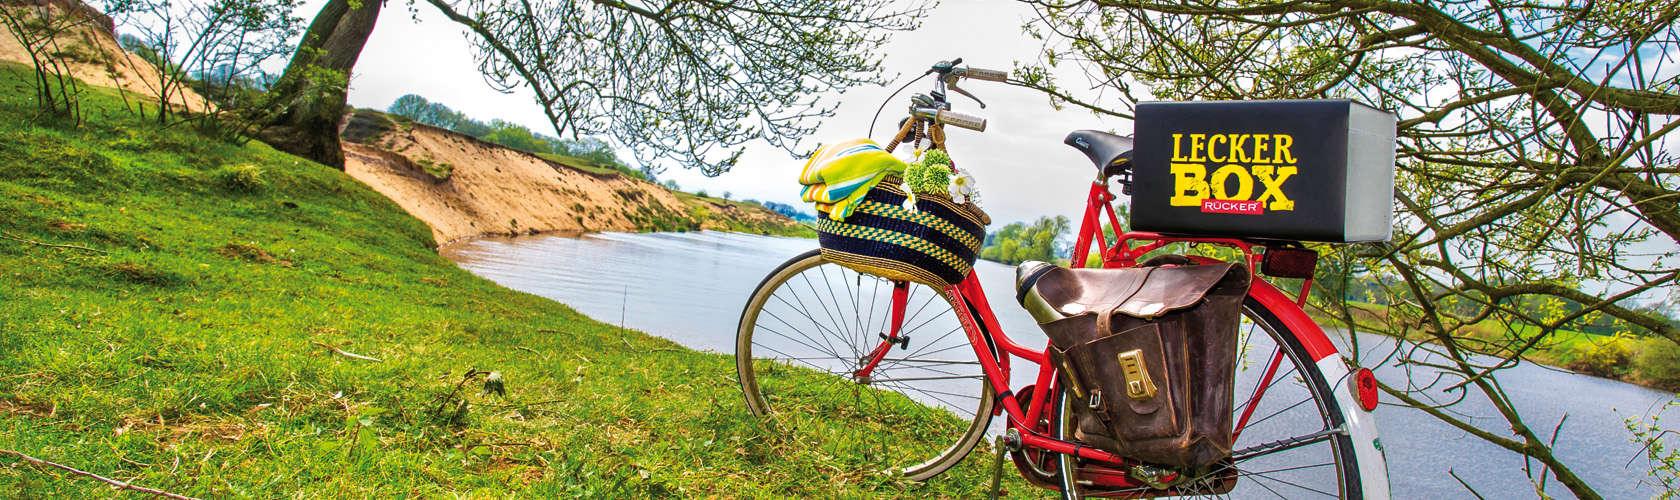 Rücker Lecker Box auf Fahrrad